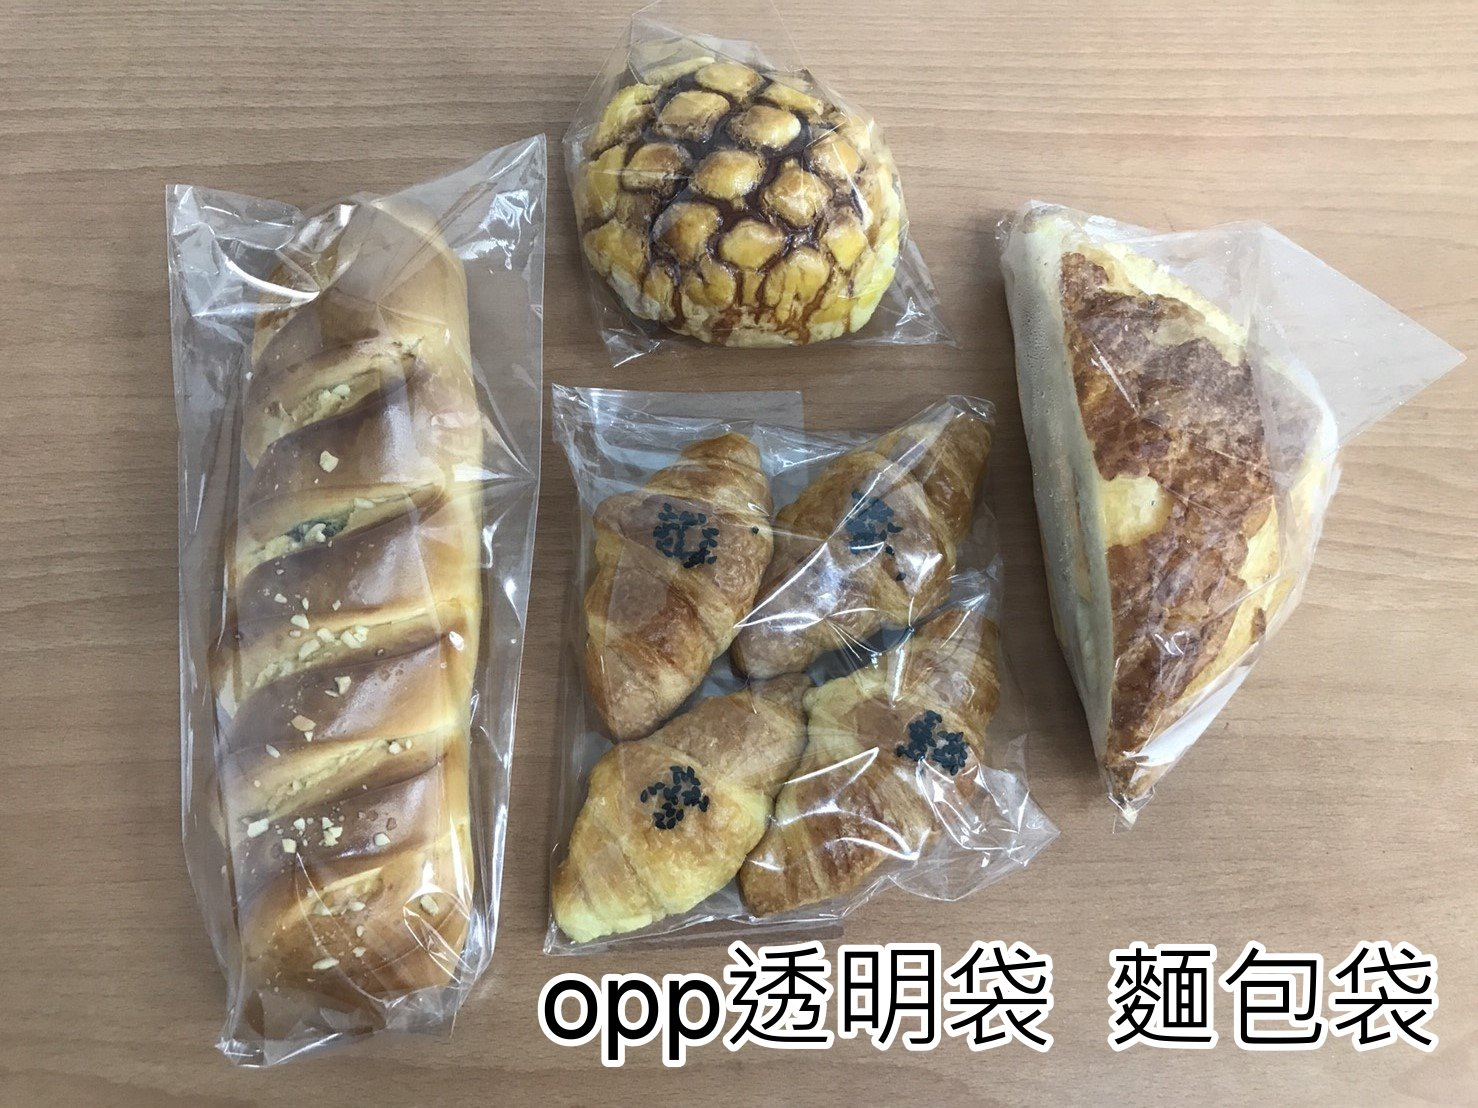 opp透明袋麵包袋